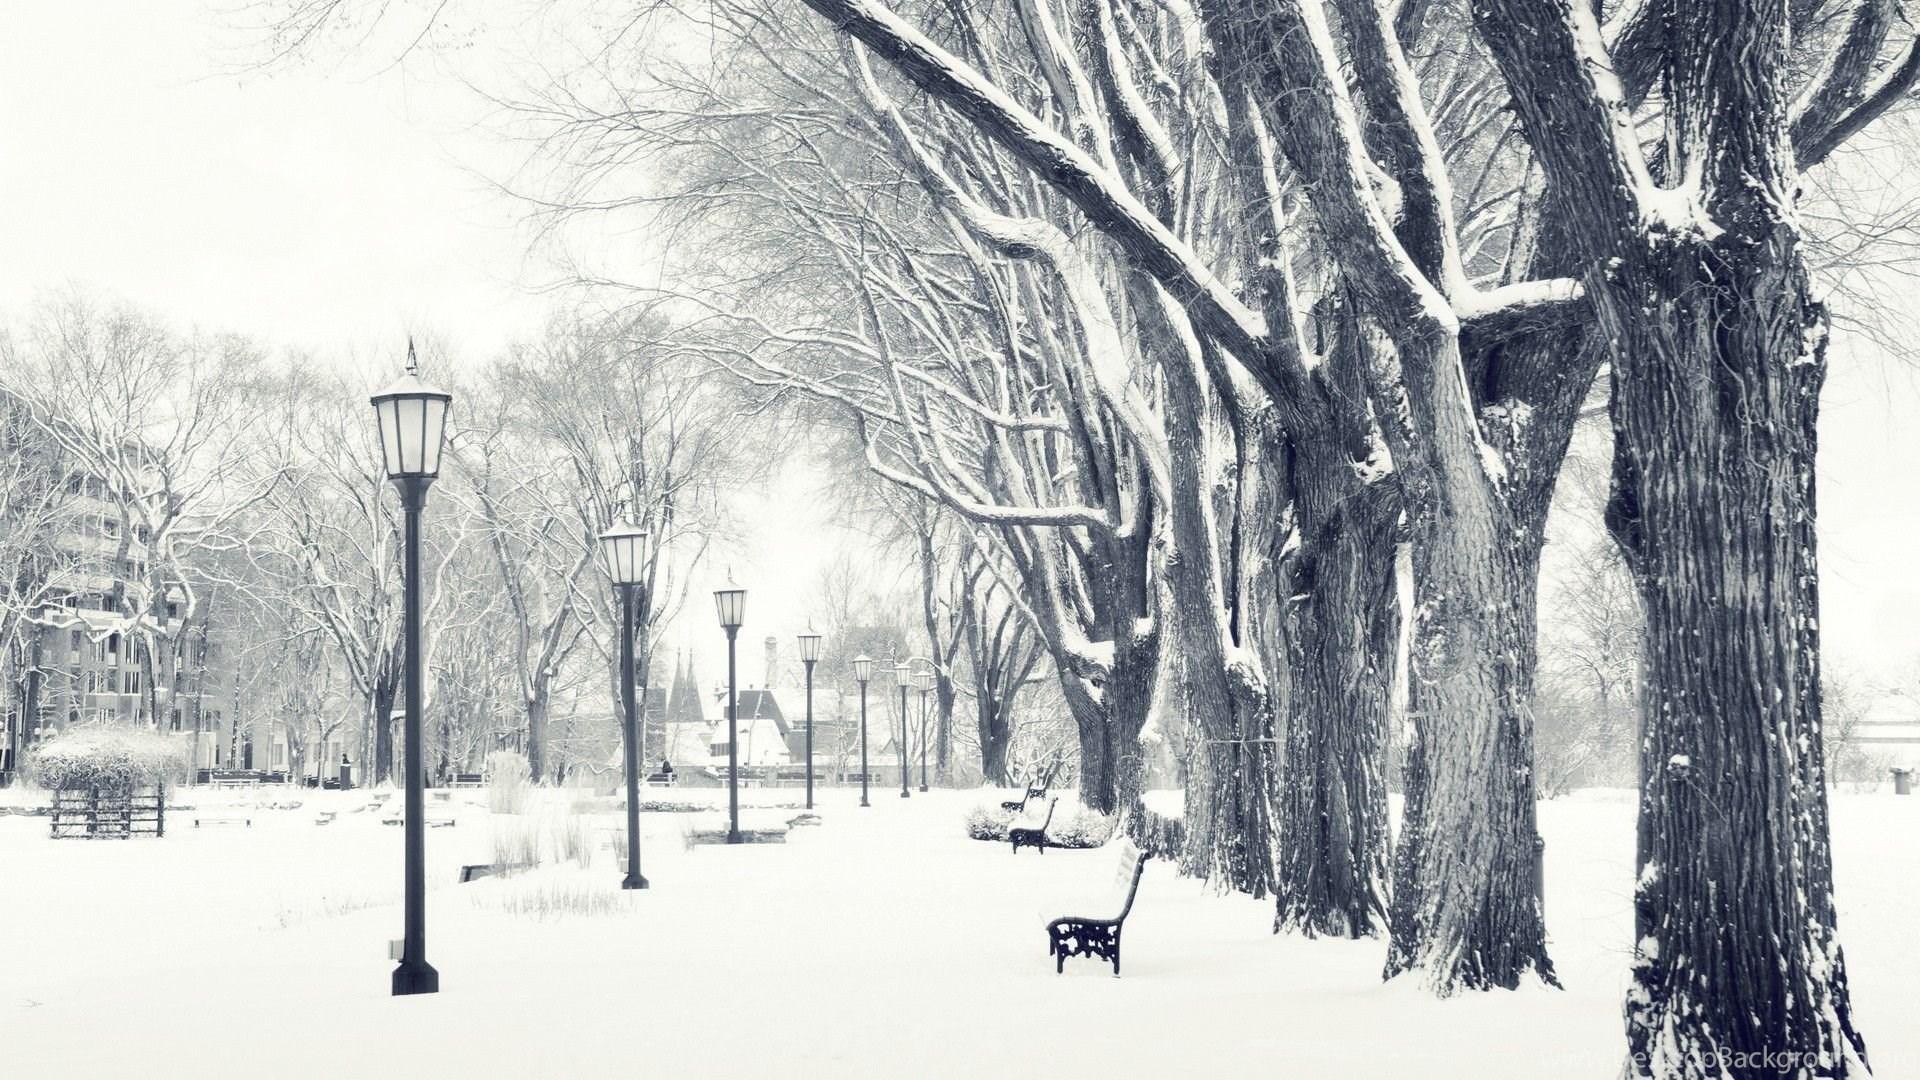 snow falling hd wallpapers desktop background